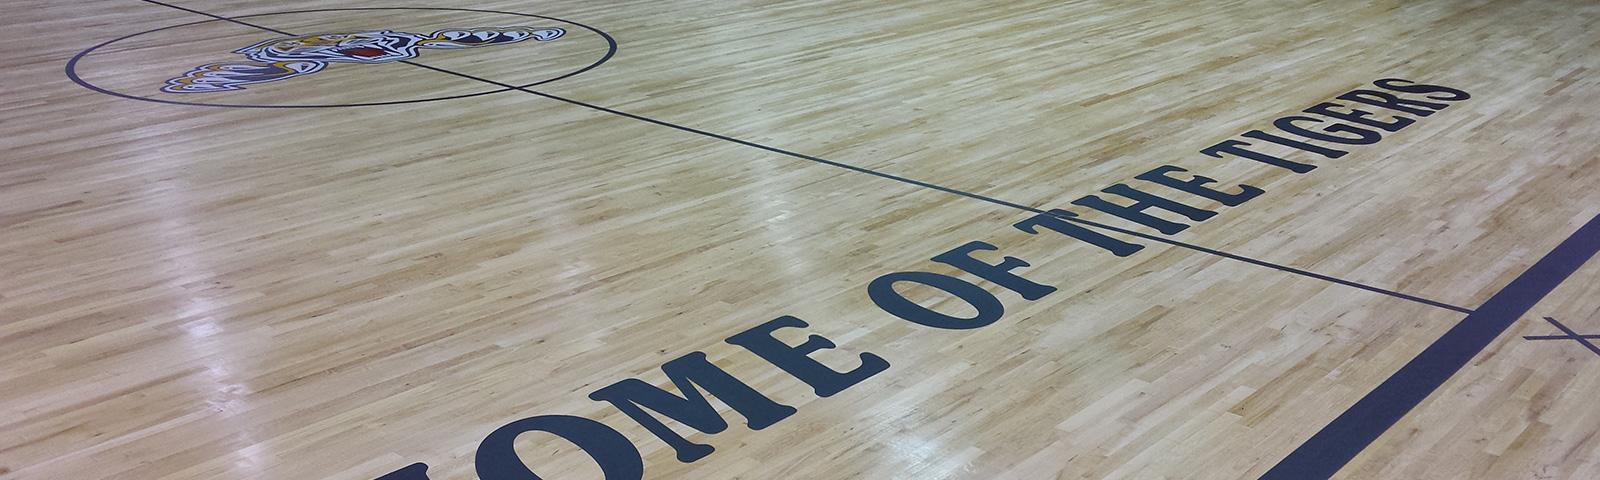 Richey Hardwood Floors - Gym Flooring